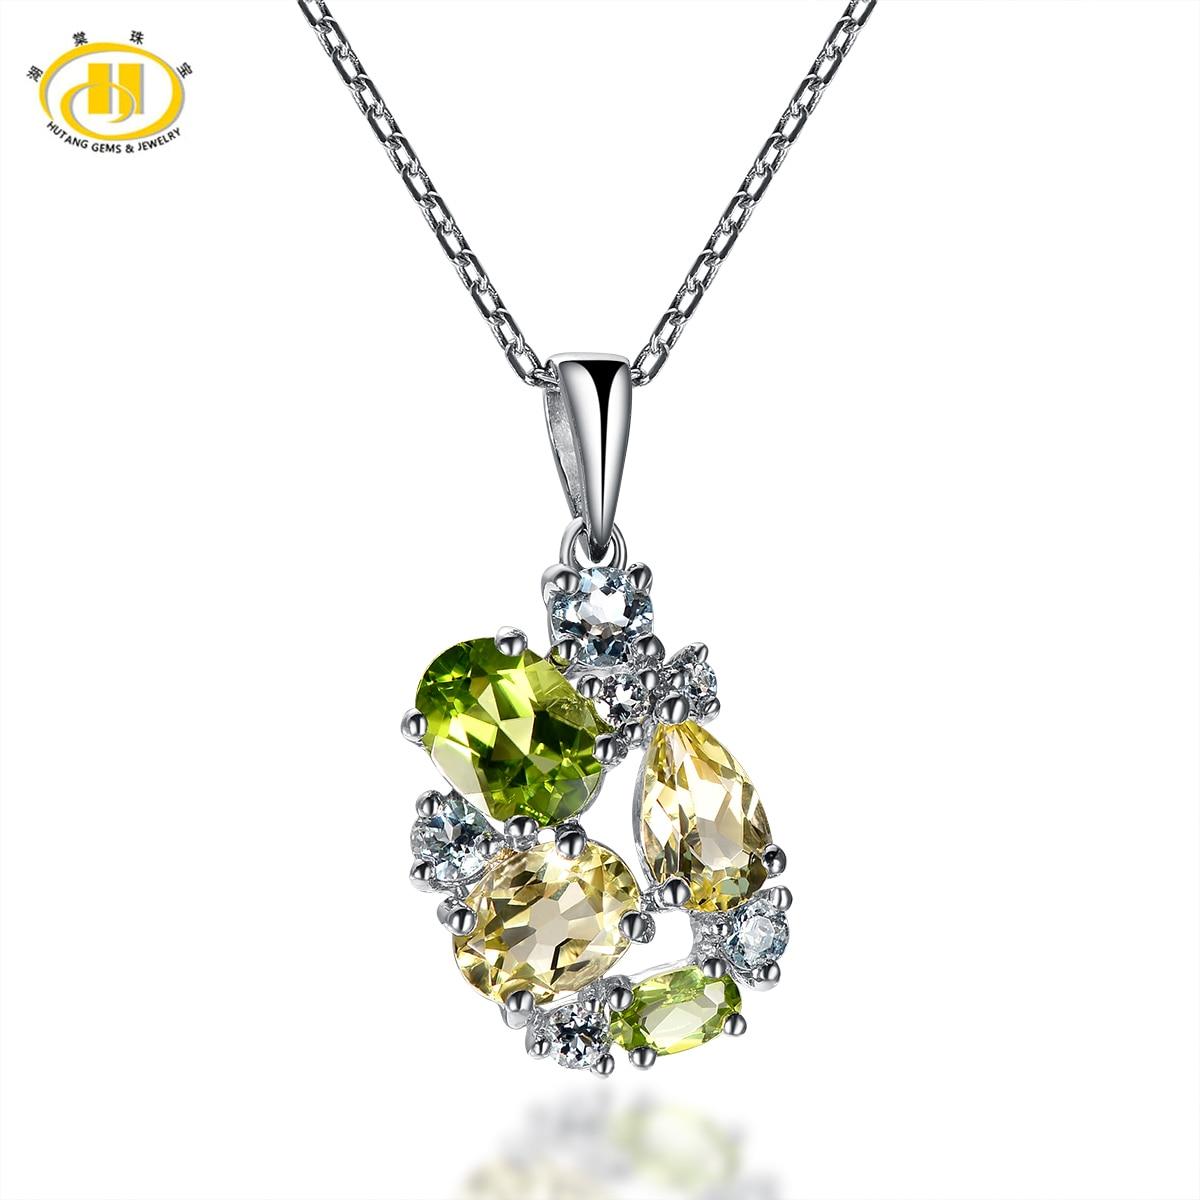 Hutang Trendy Real Peridot, Lemon Star Quartz & Aquamarine 925 Sterling Silver Pendant Necklace Jewelry Free Chain For Women